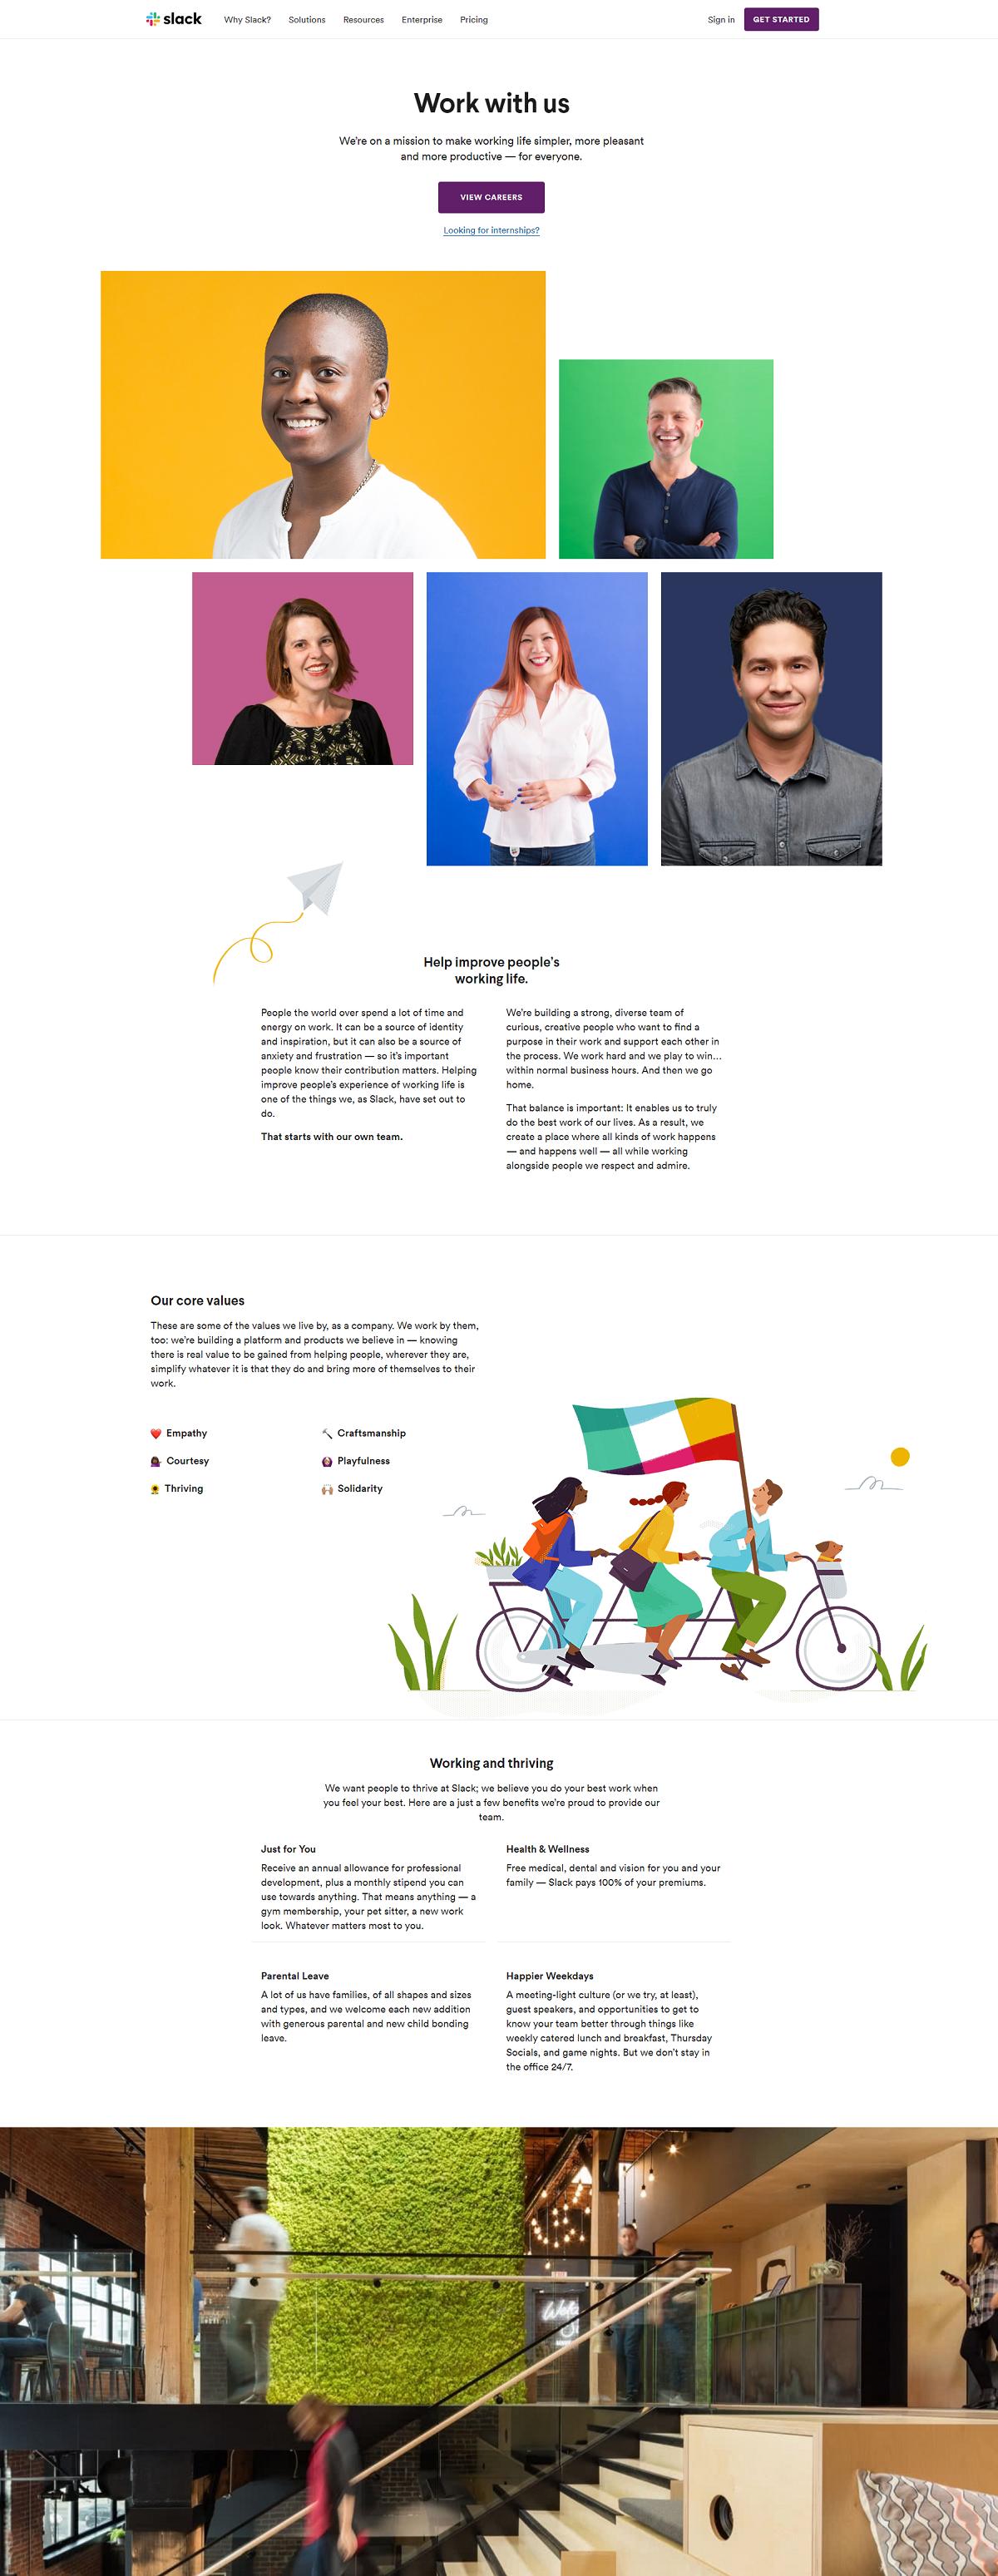 Slack company career page